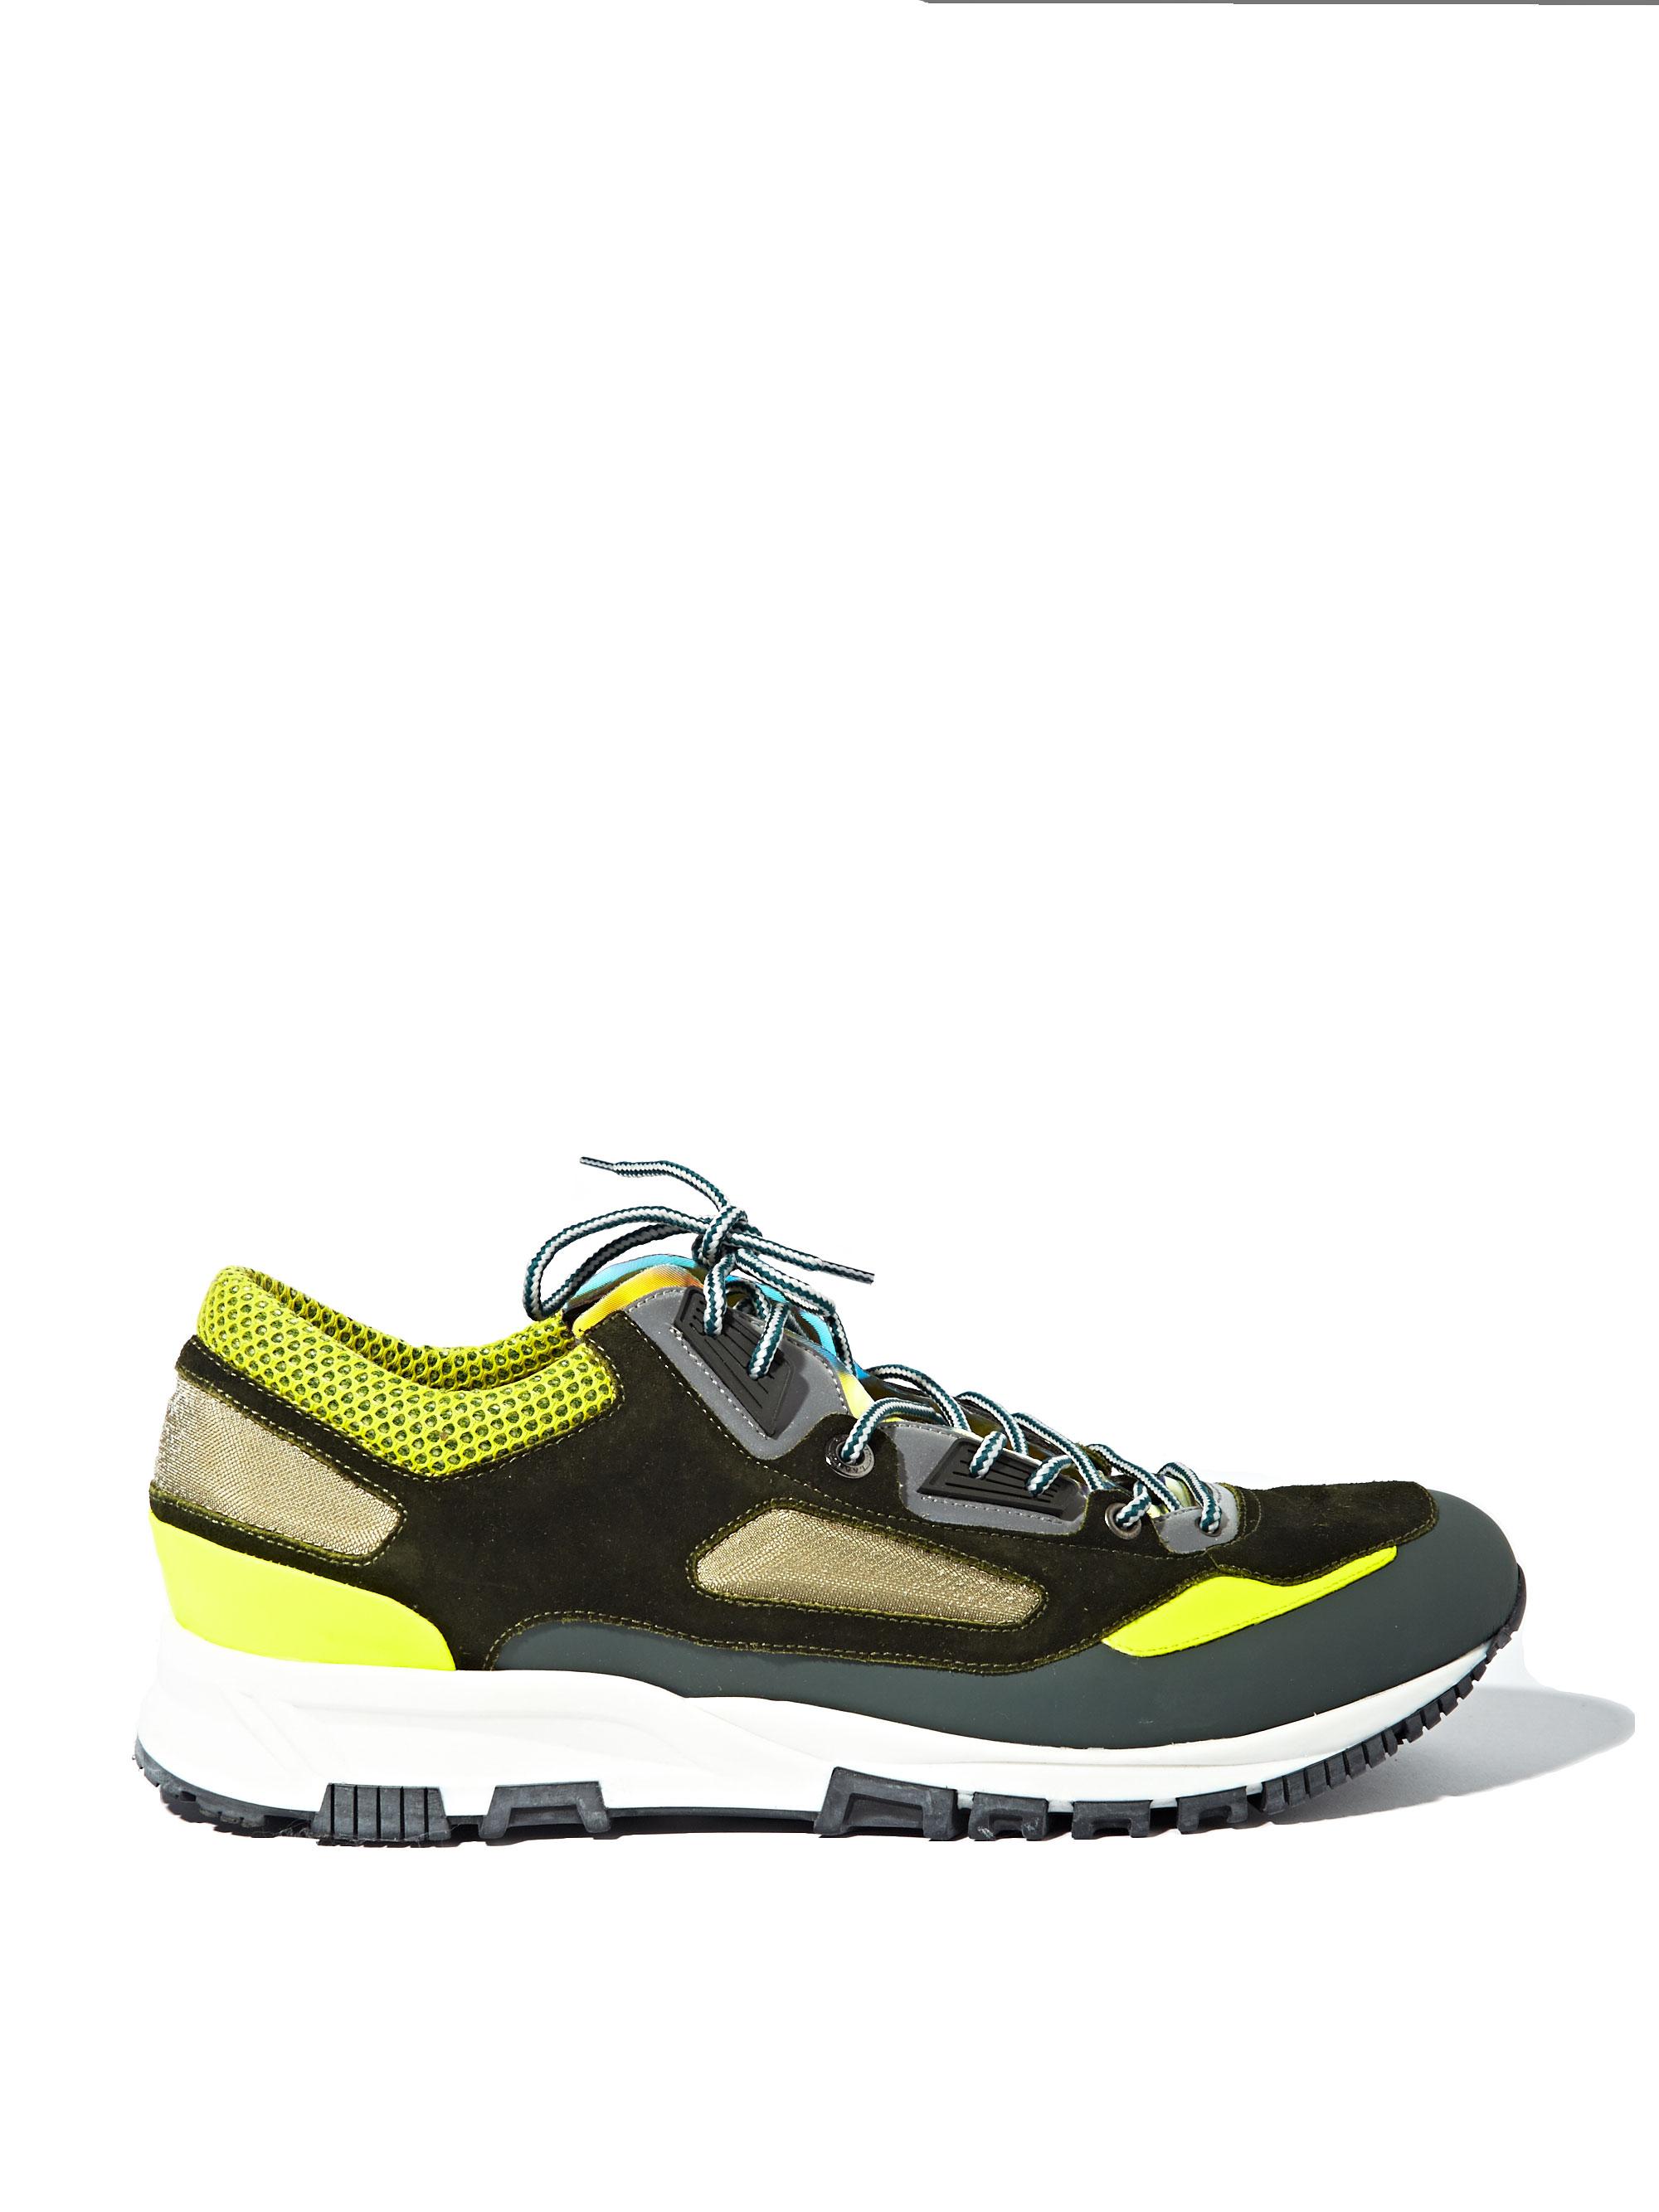 Green and Grey Sport Sneakers Lanvin x4J0z